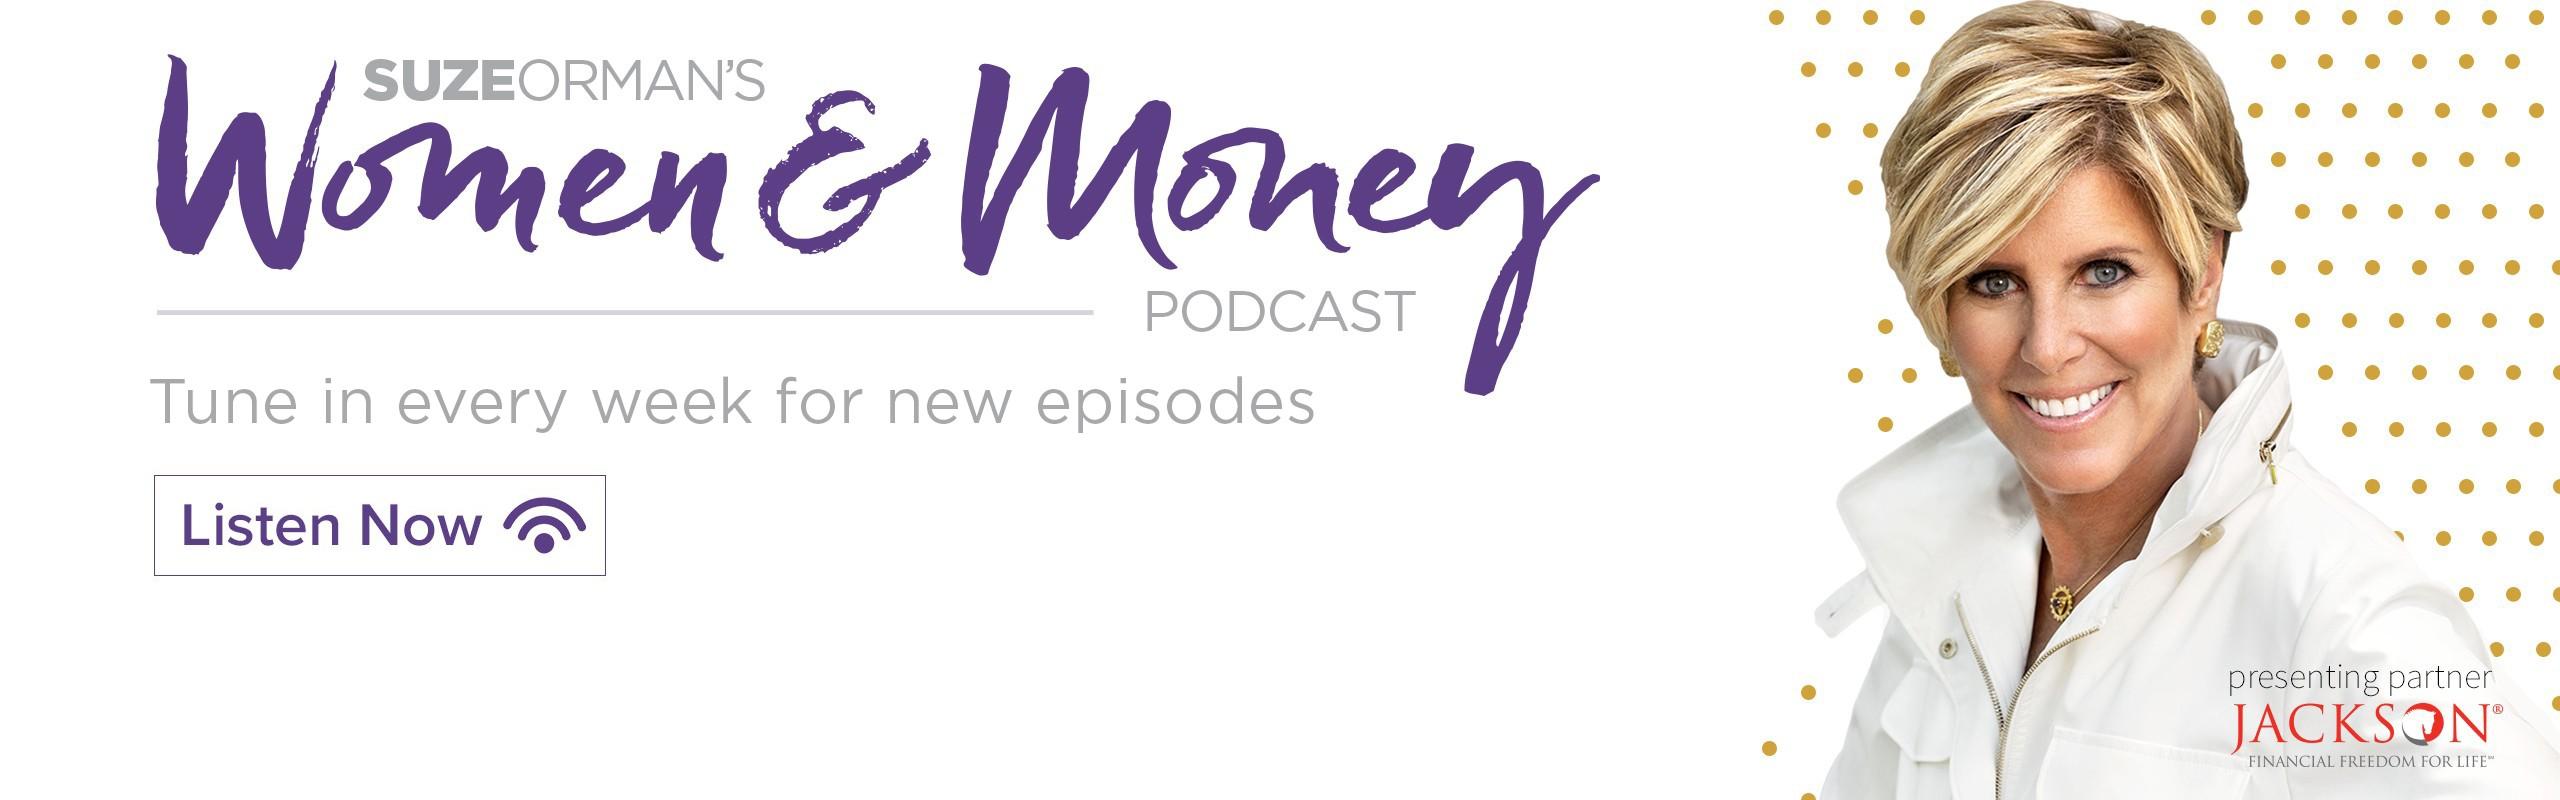 Suze Orman : Personal Finance Expert